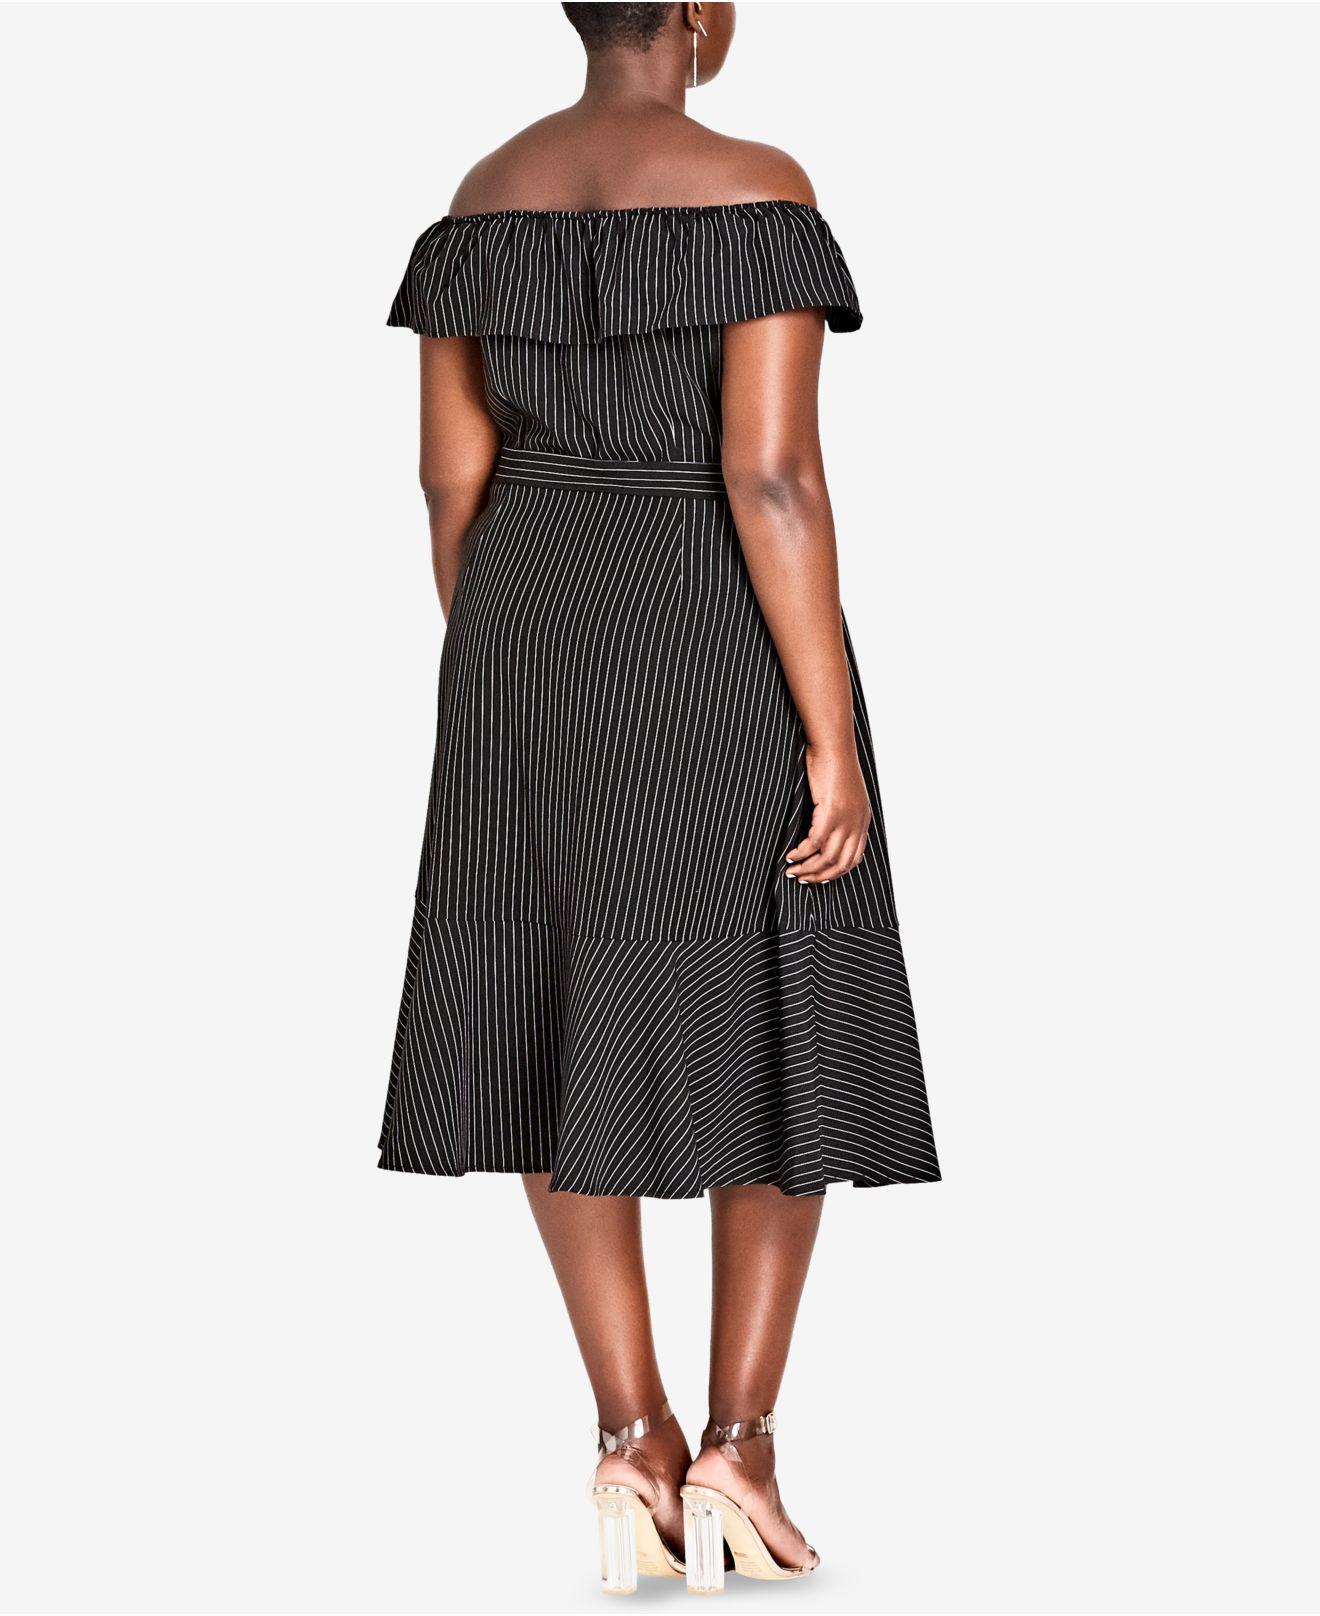 ffbf9219c7b1e Lyst - City Chic Trendy Plus Size Off-the-shoulder Dress in Black